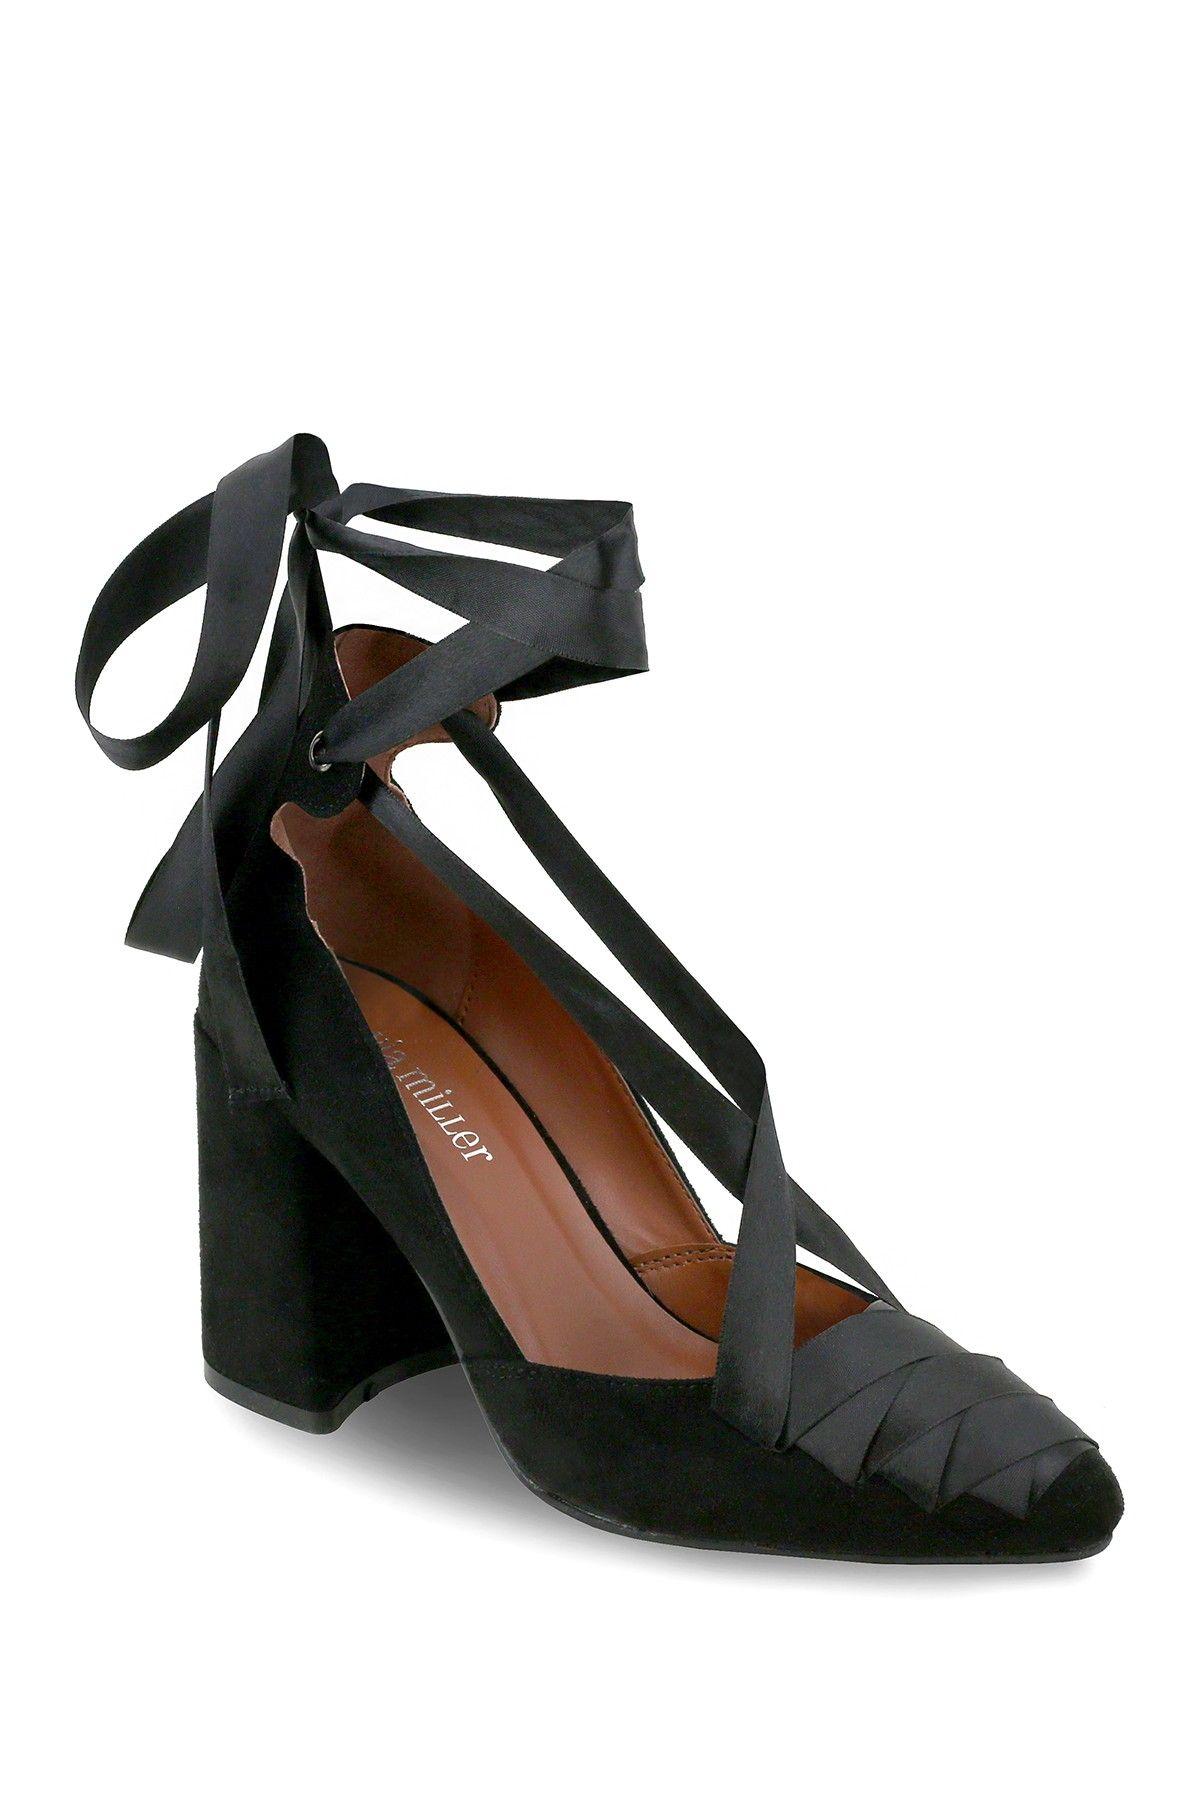 Olivia Miller Greenpoint Lace Up Ribbon Pump Nordstrom Rack Womens High Heels Women S Slip On Shoes Black High Heels